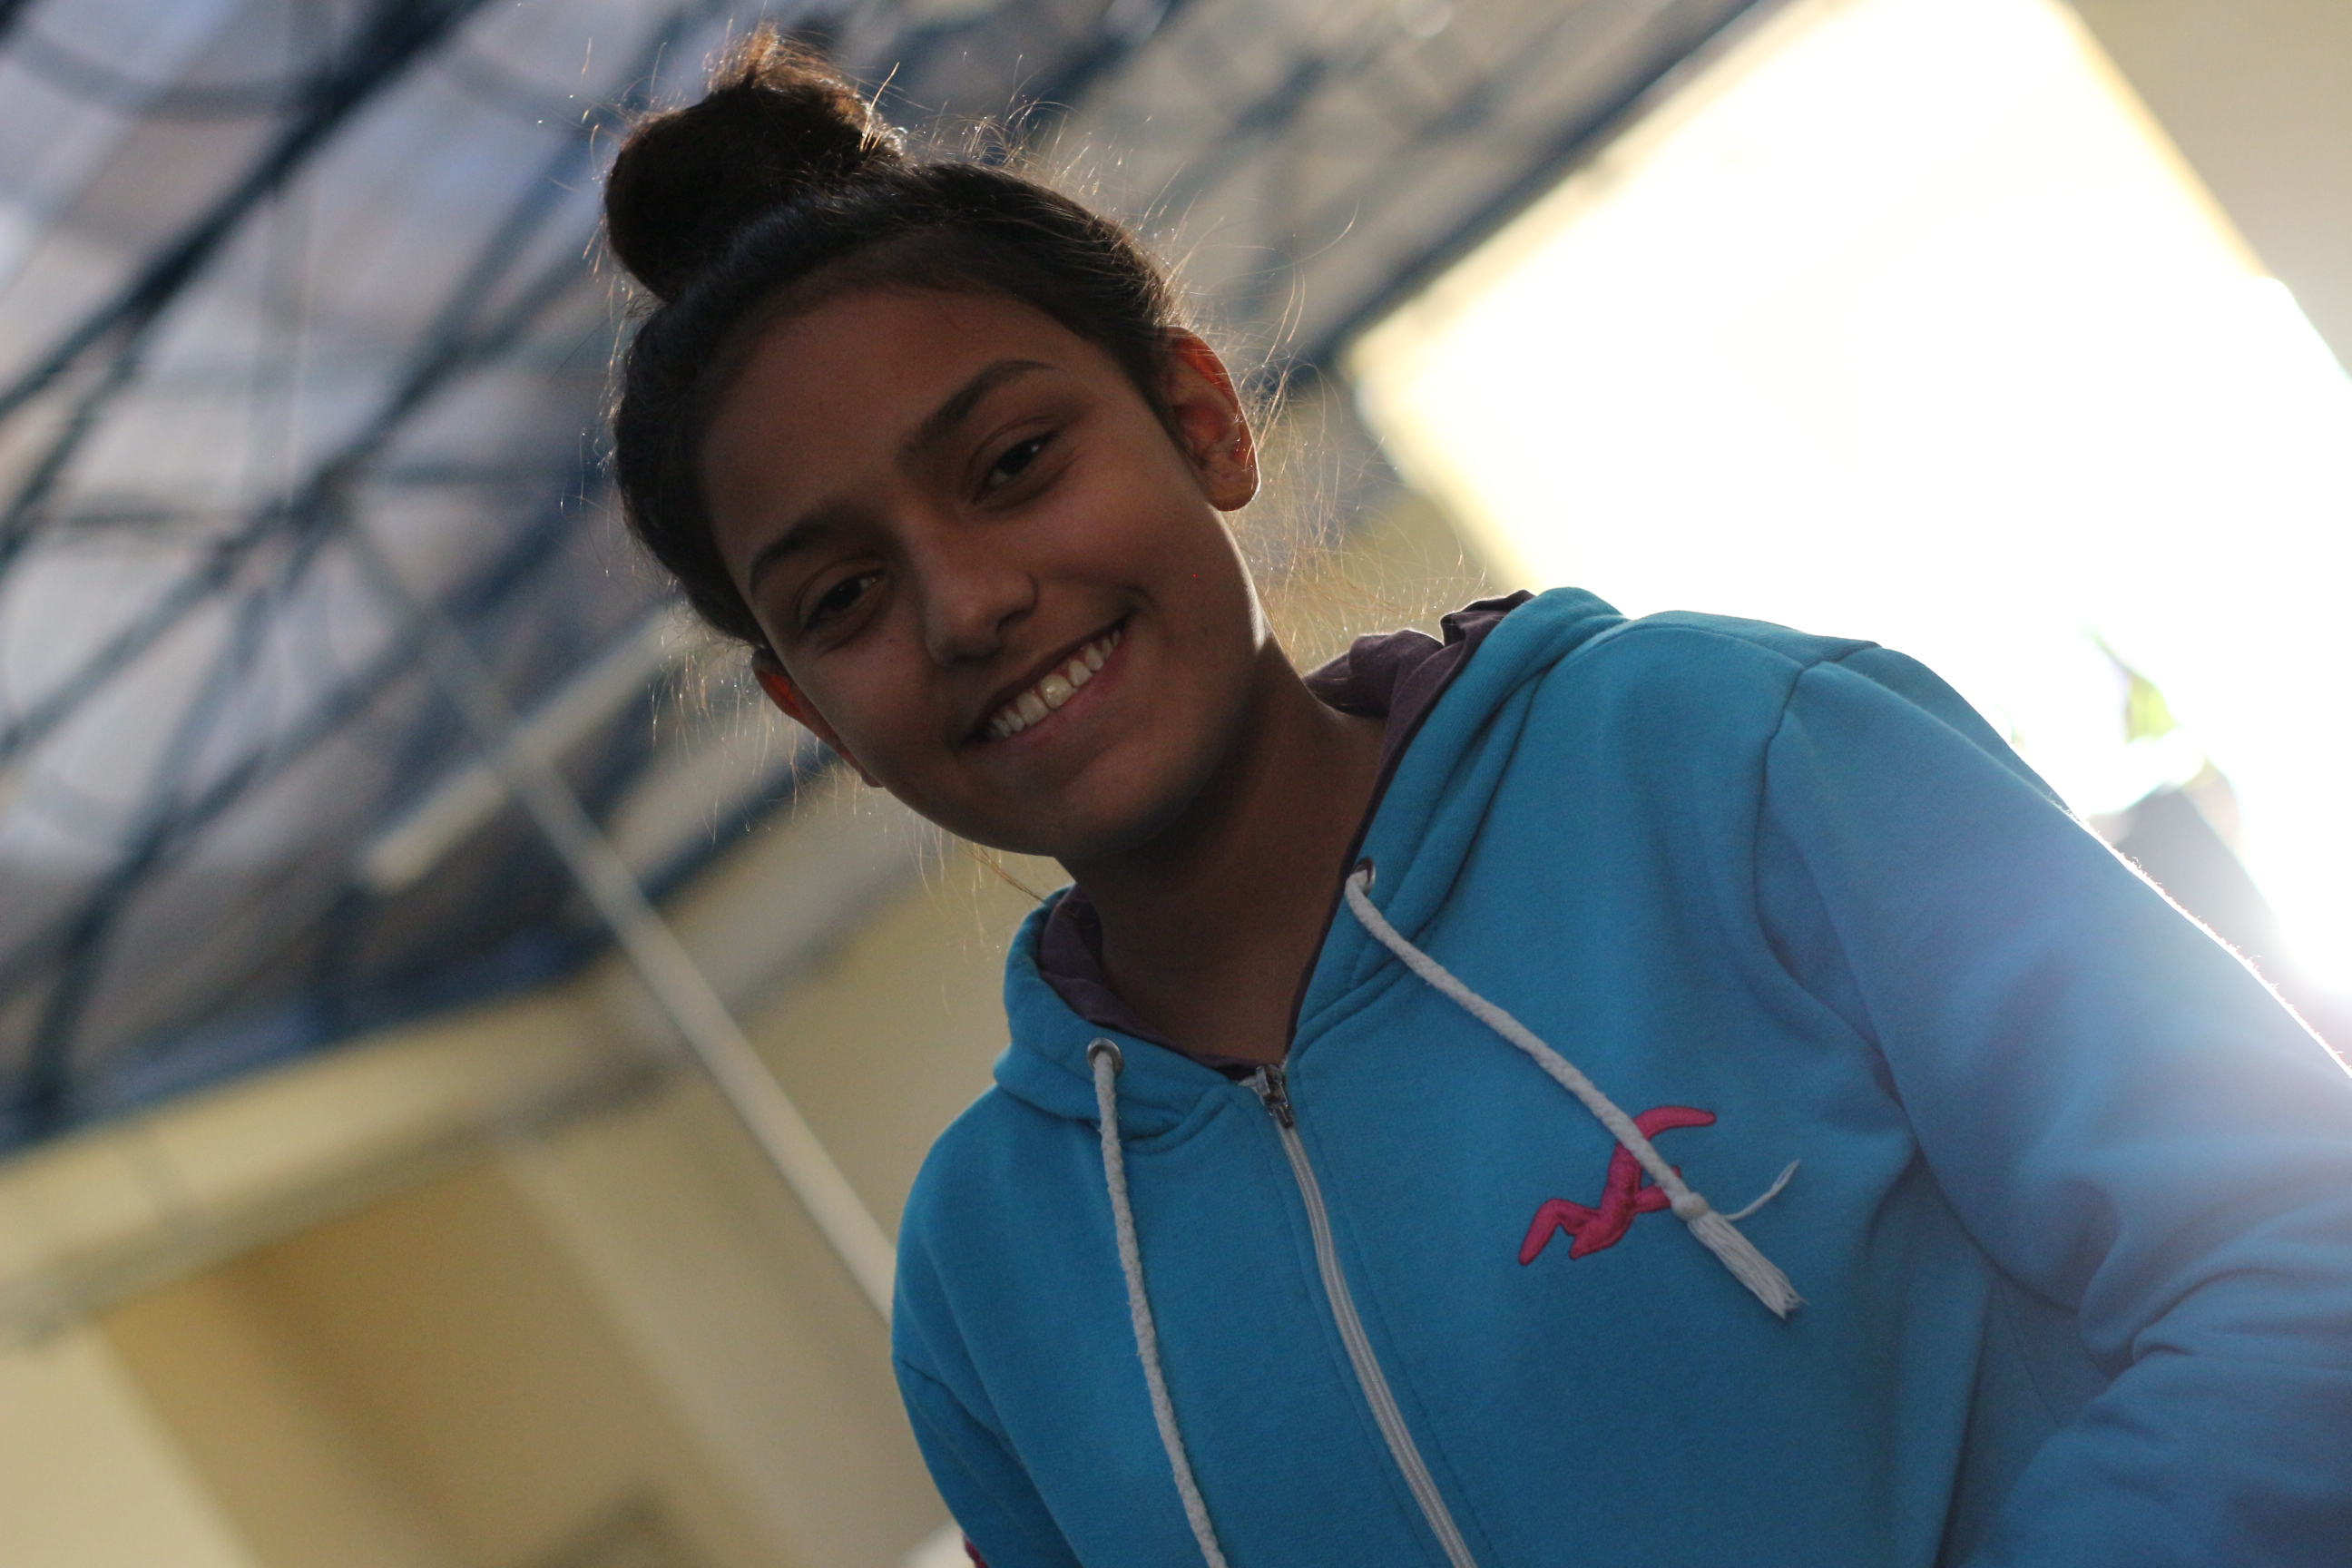 Jennifer Jetka, 13, integrante da Equipe JUNO